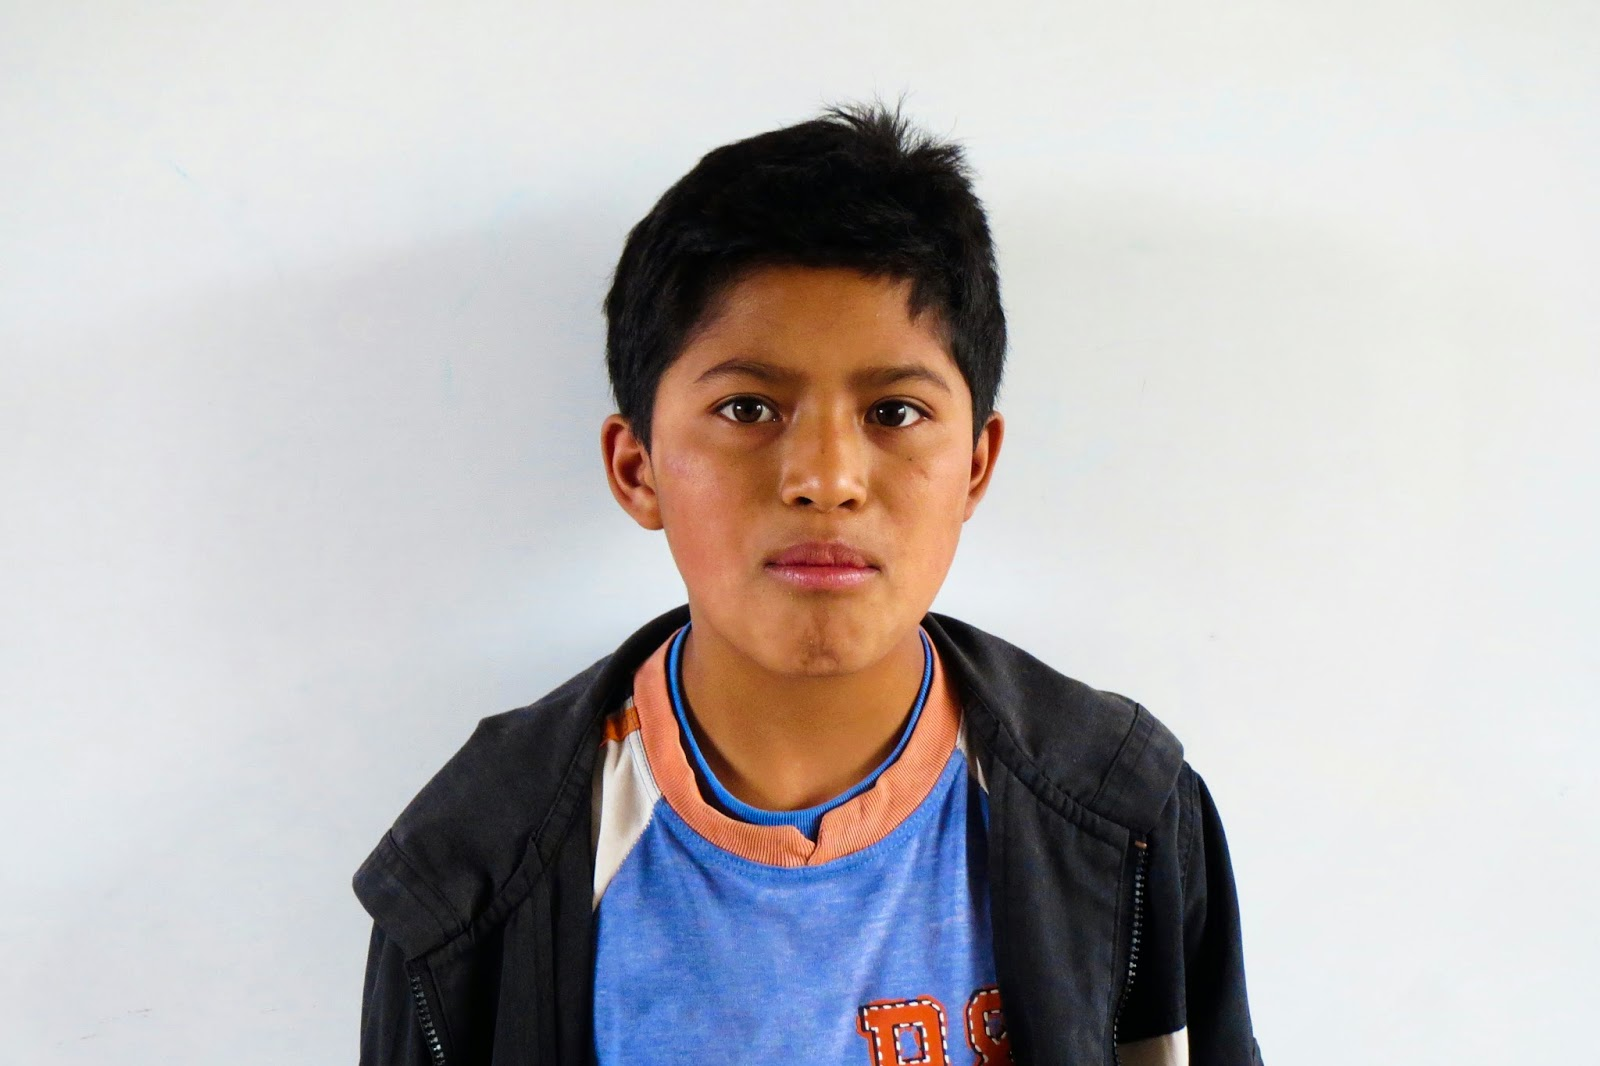 Holguer, Age 11